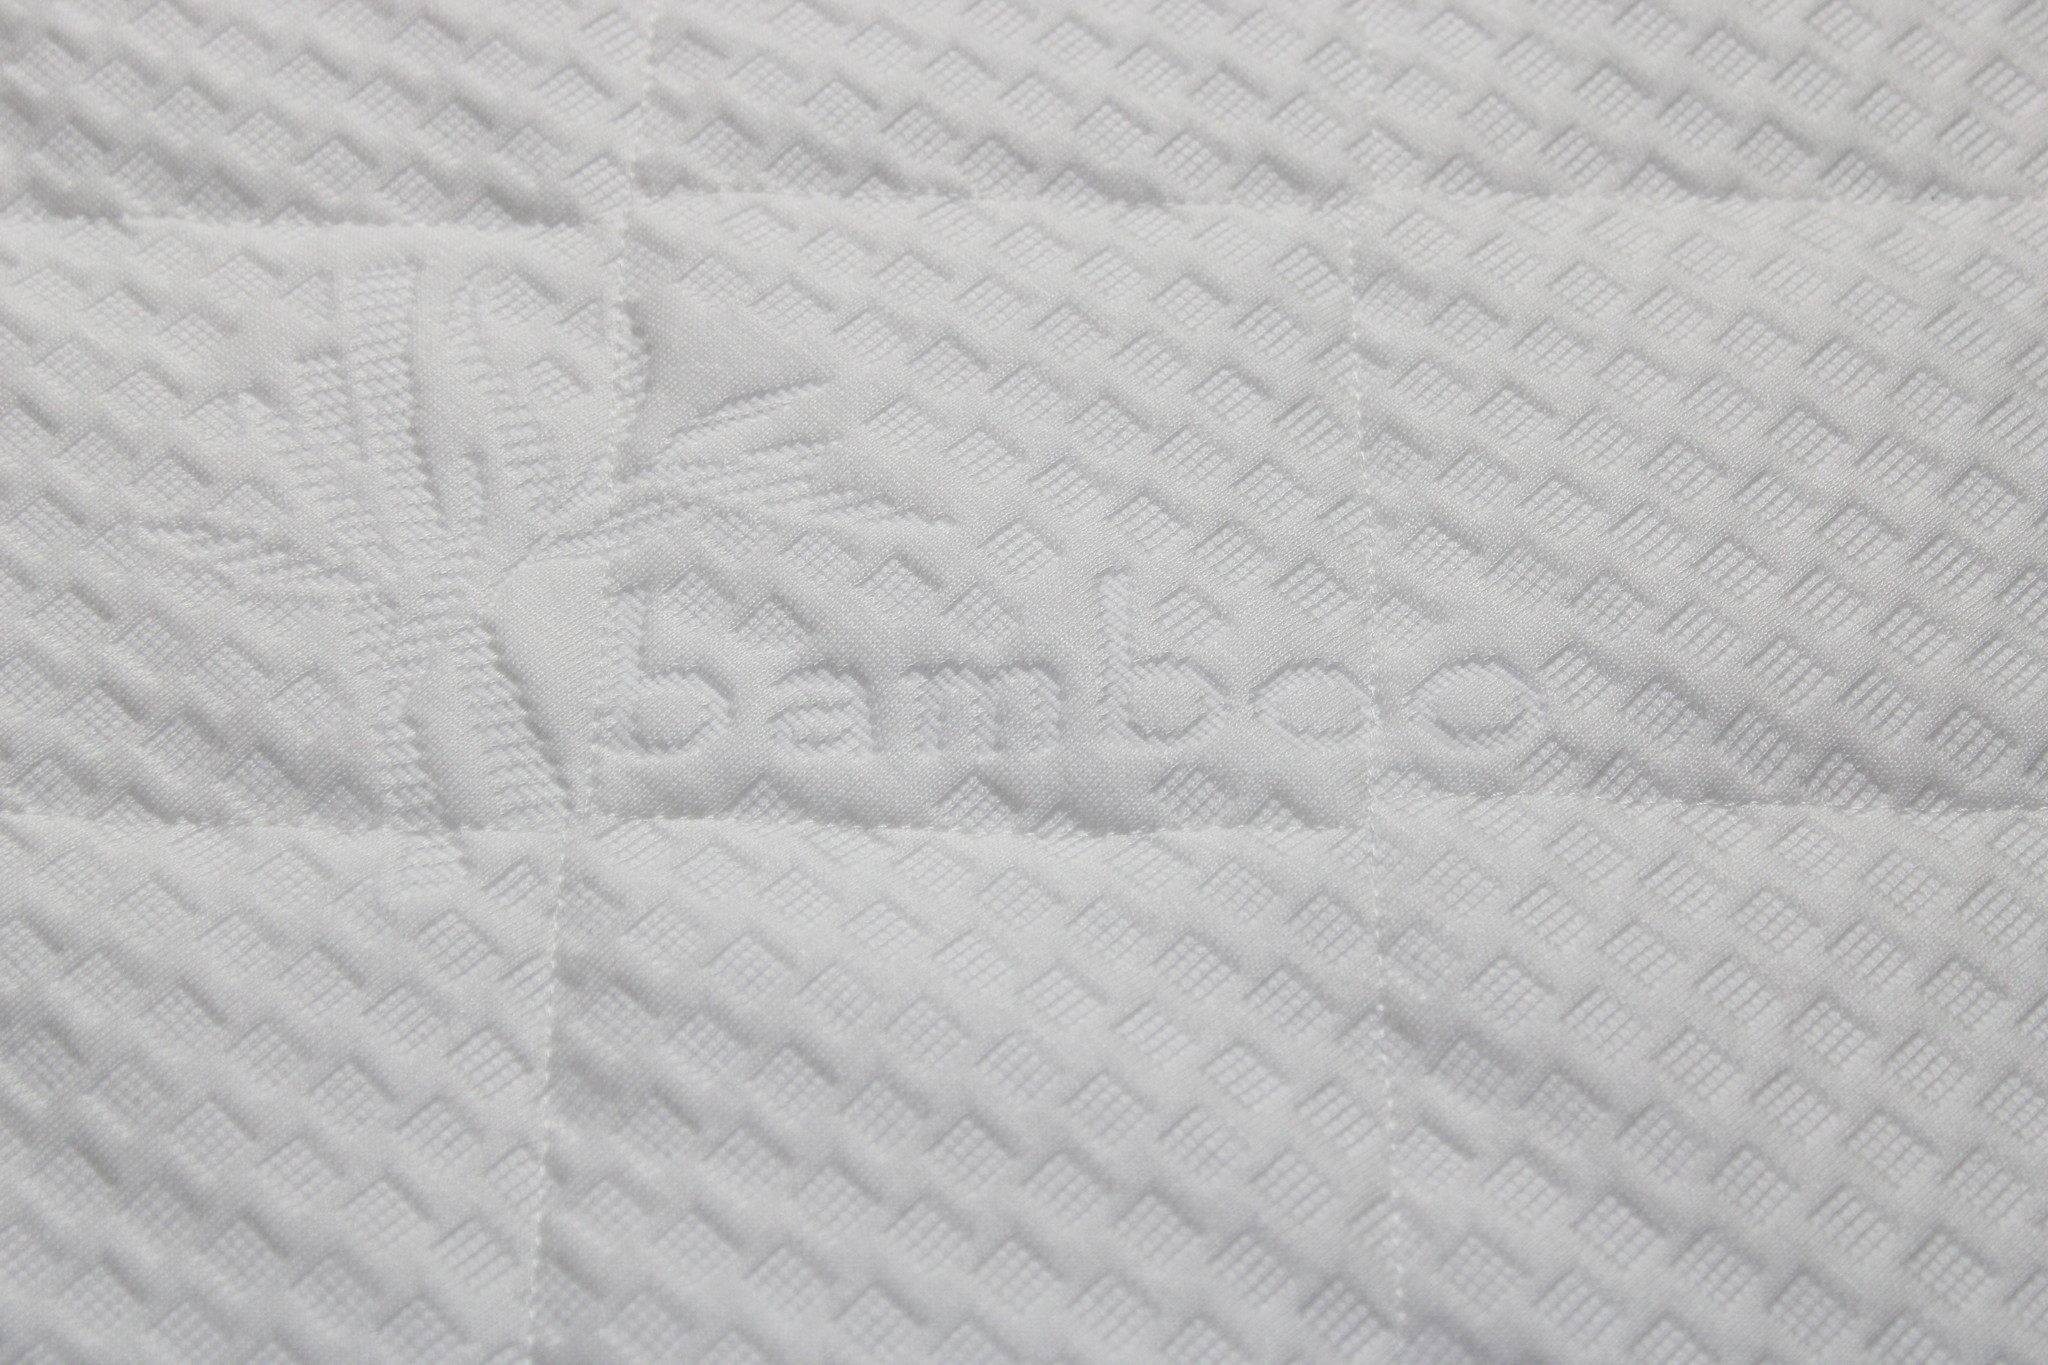 Sarpy Kindermatras 90x185 koudschuim HR55 bamboo